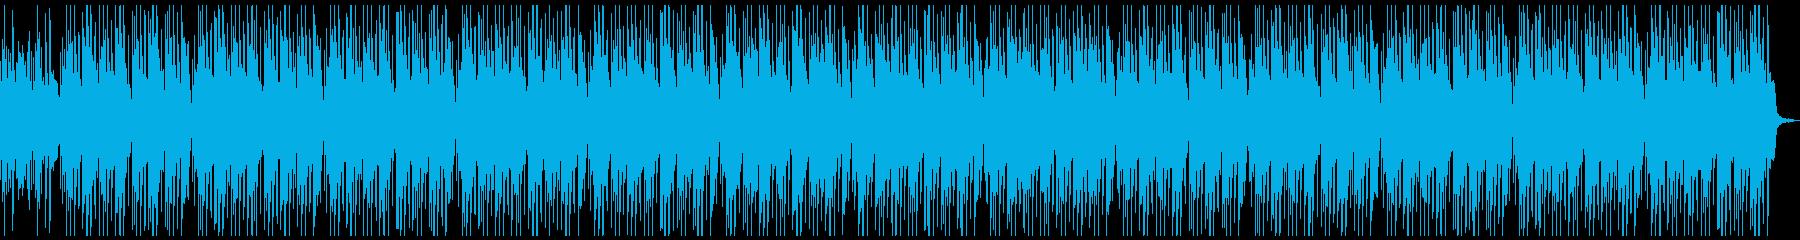 528Hz笛と民族楽器の瞑想BGMの再生済みの波形